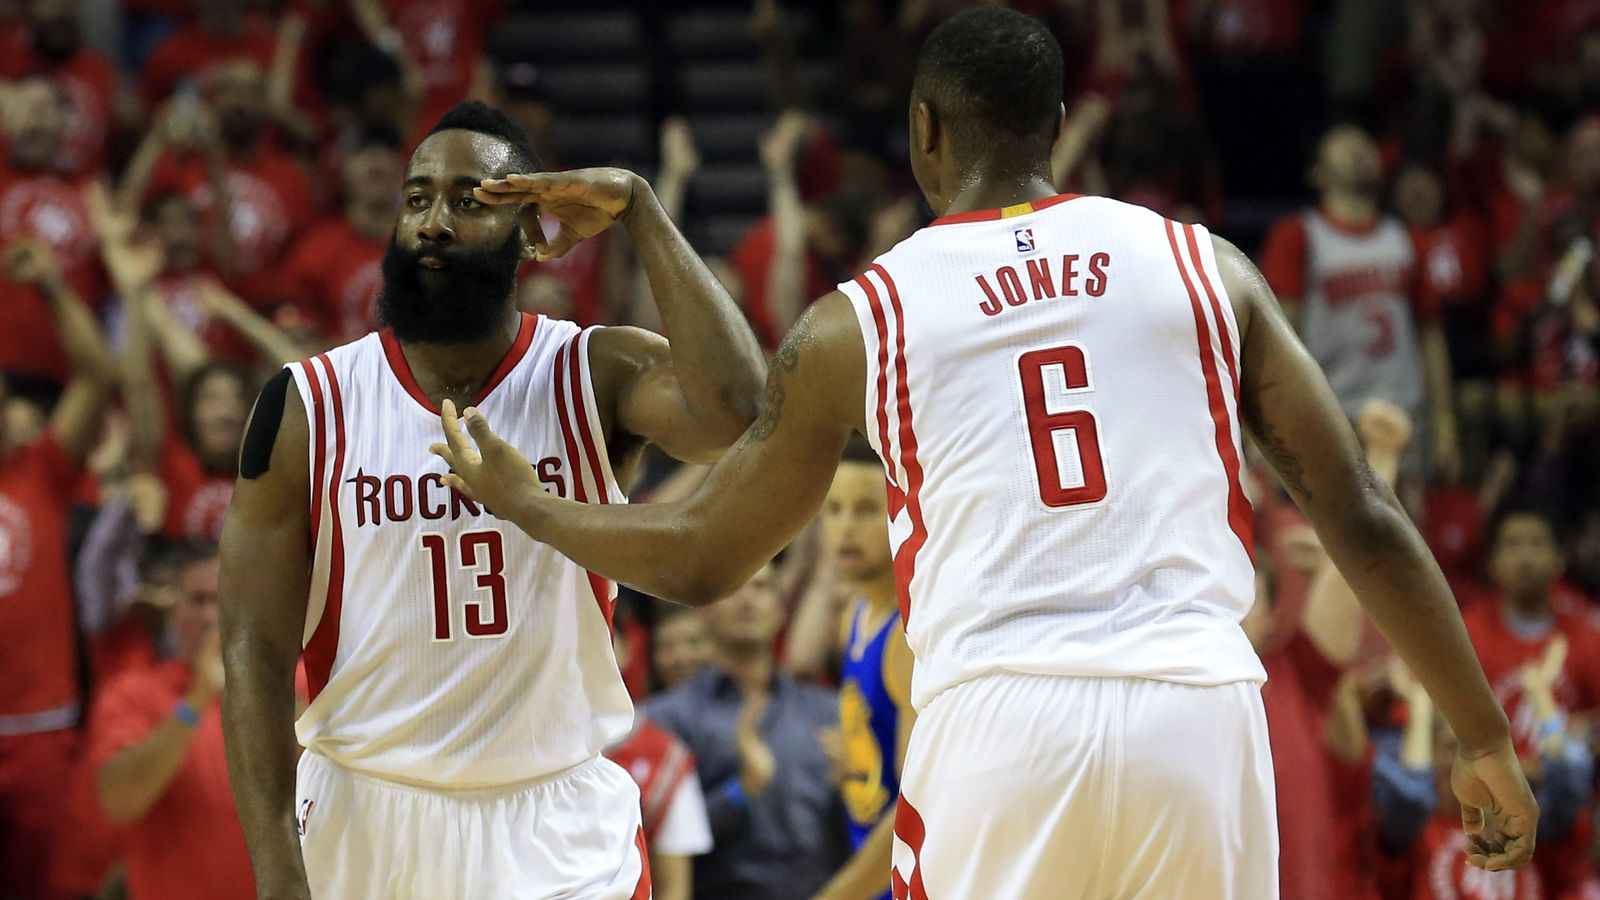 Rockets vs. Warriors Game 4 final score: Harden helps Houston keep hope alive - The Dream Shake